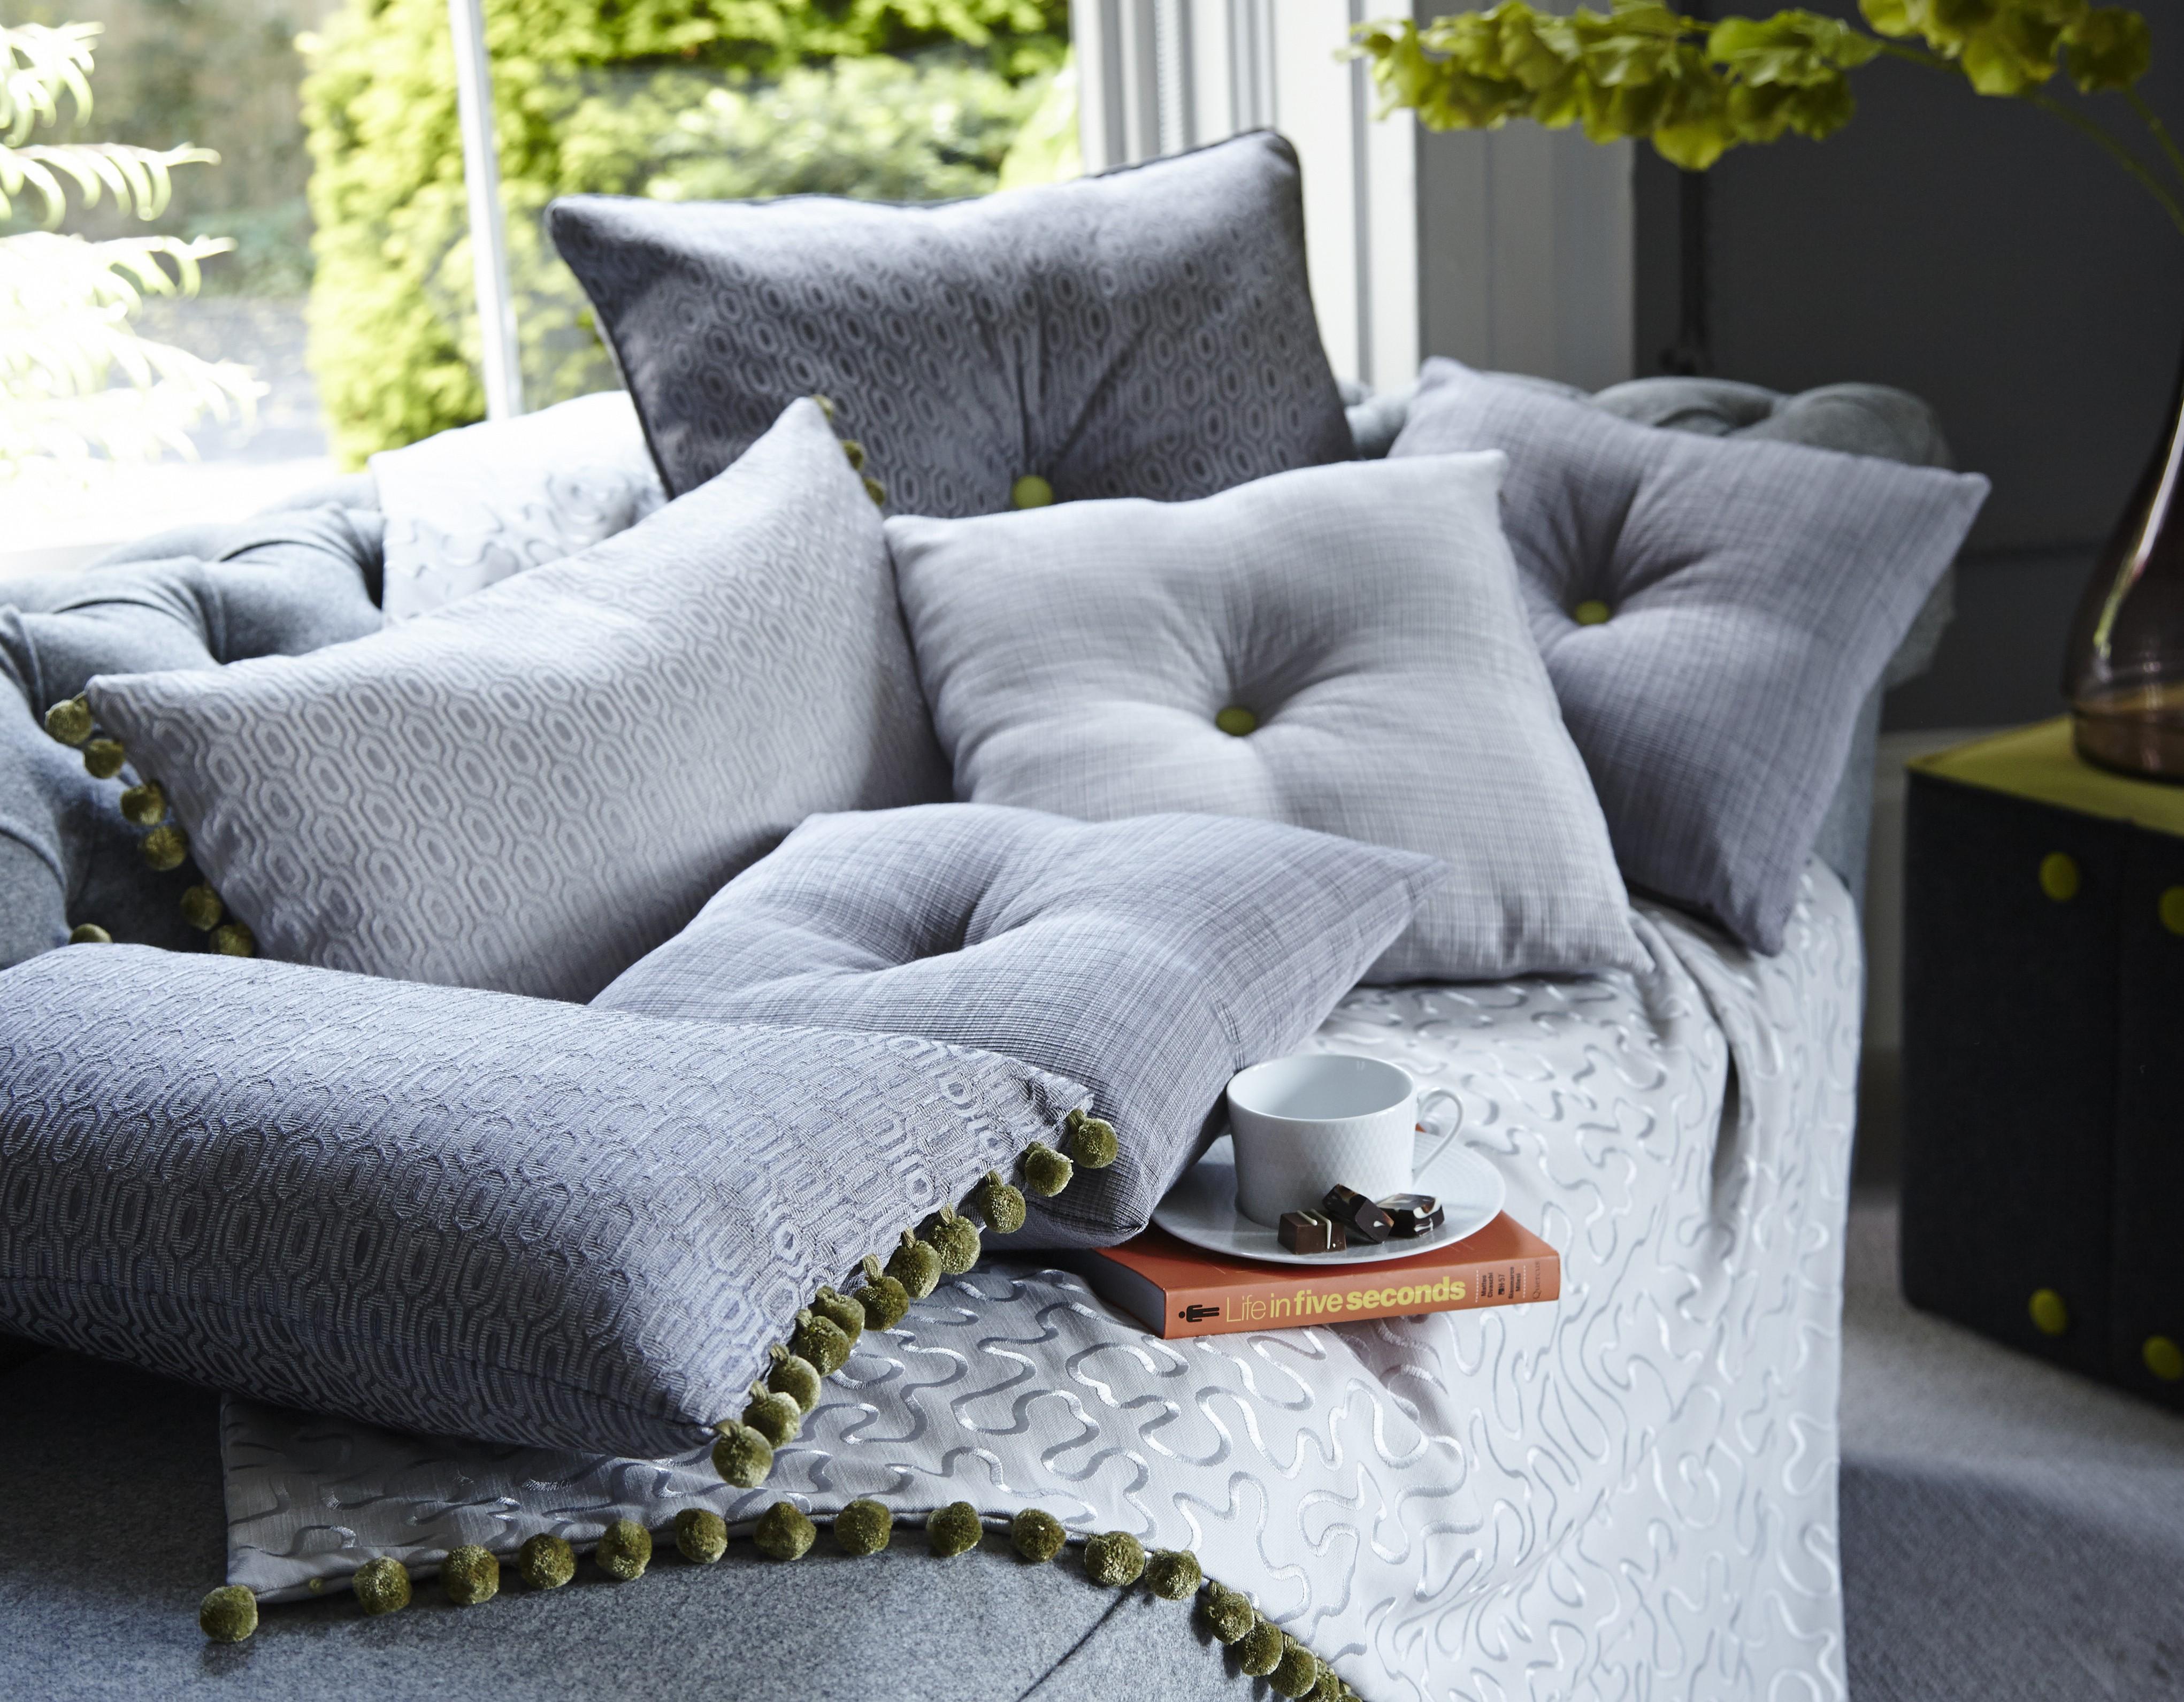 Красивые декоративные подушки на диван